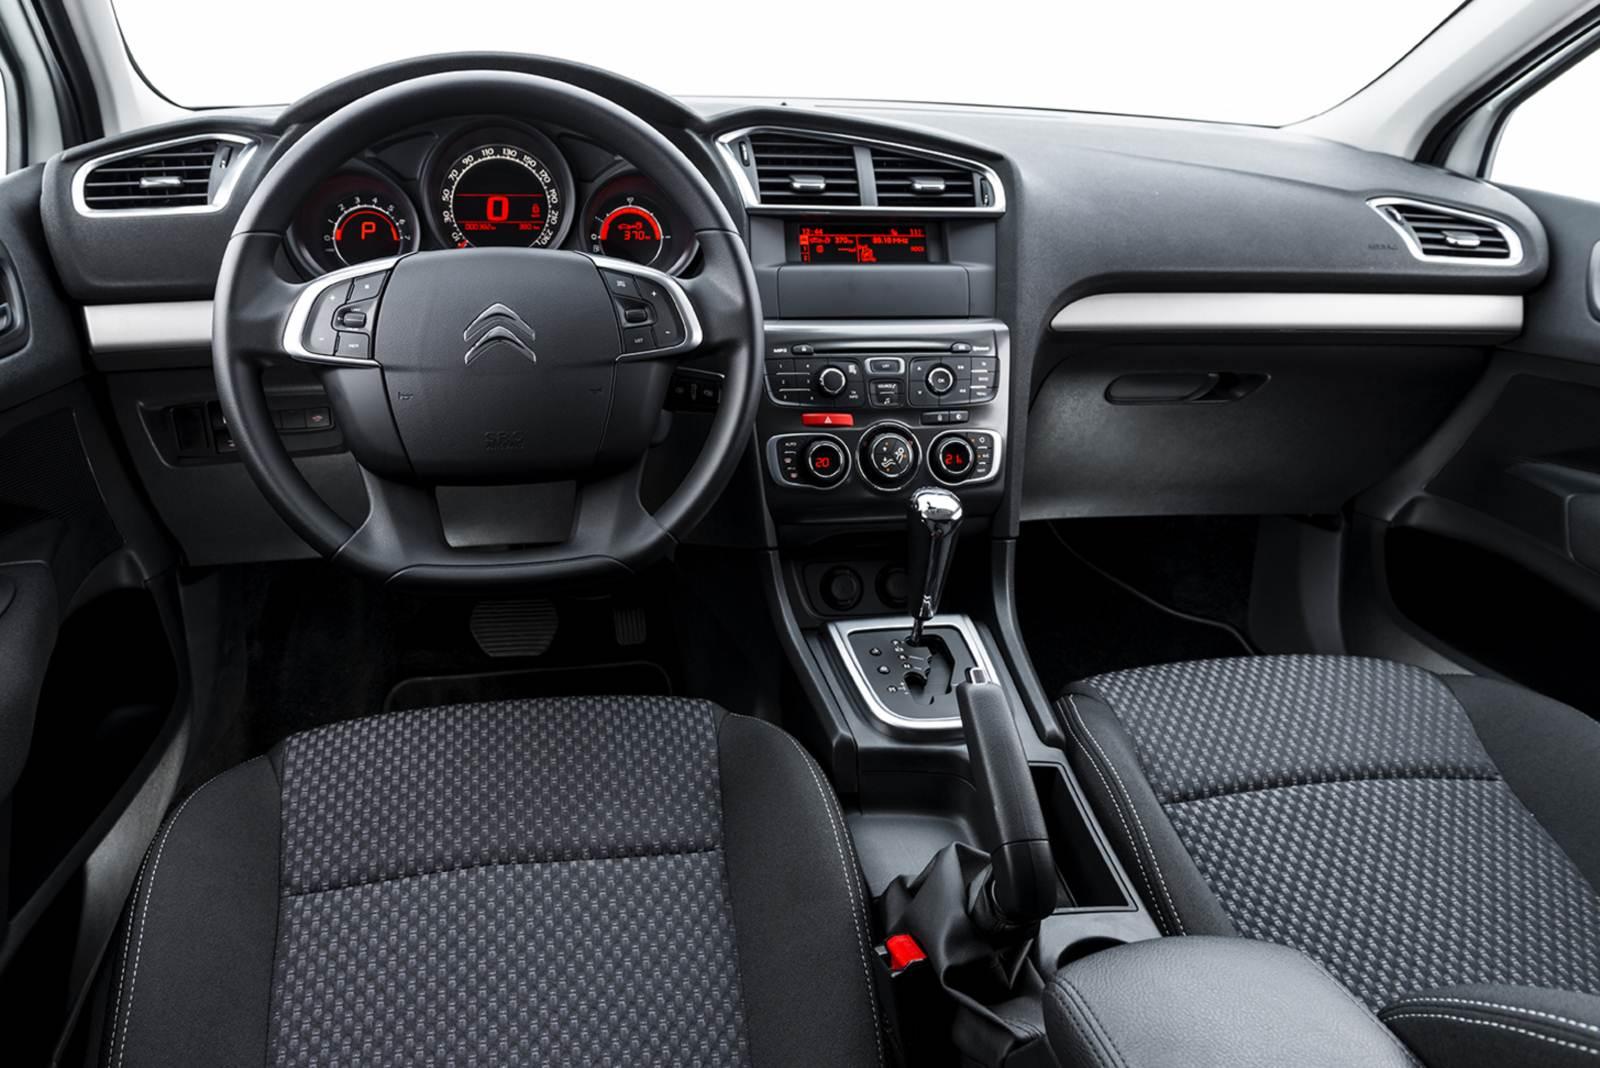 Citroen C4 Lounge Turbo terá versão mais barata Tendance ...